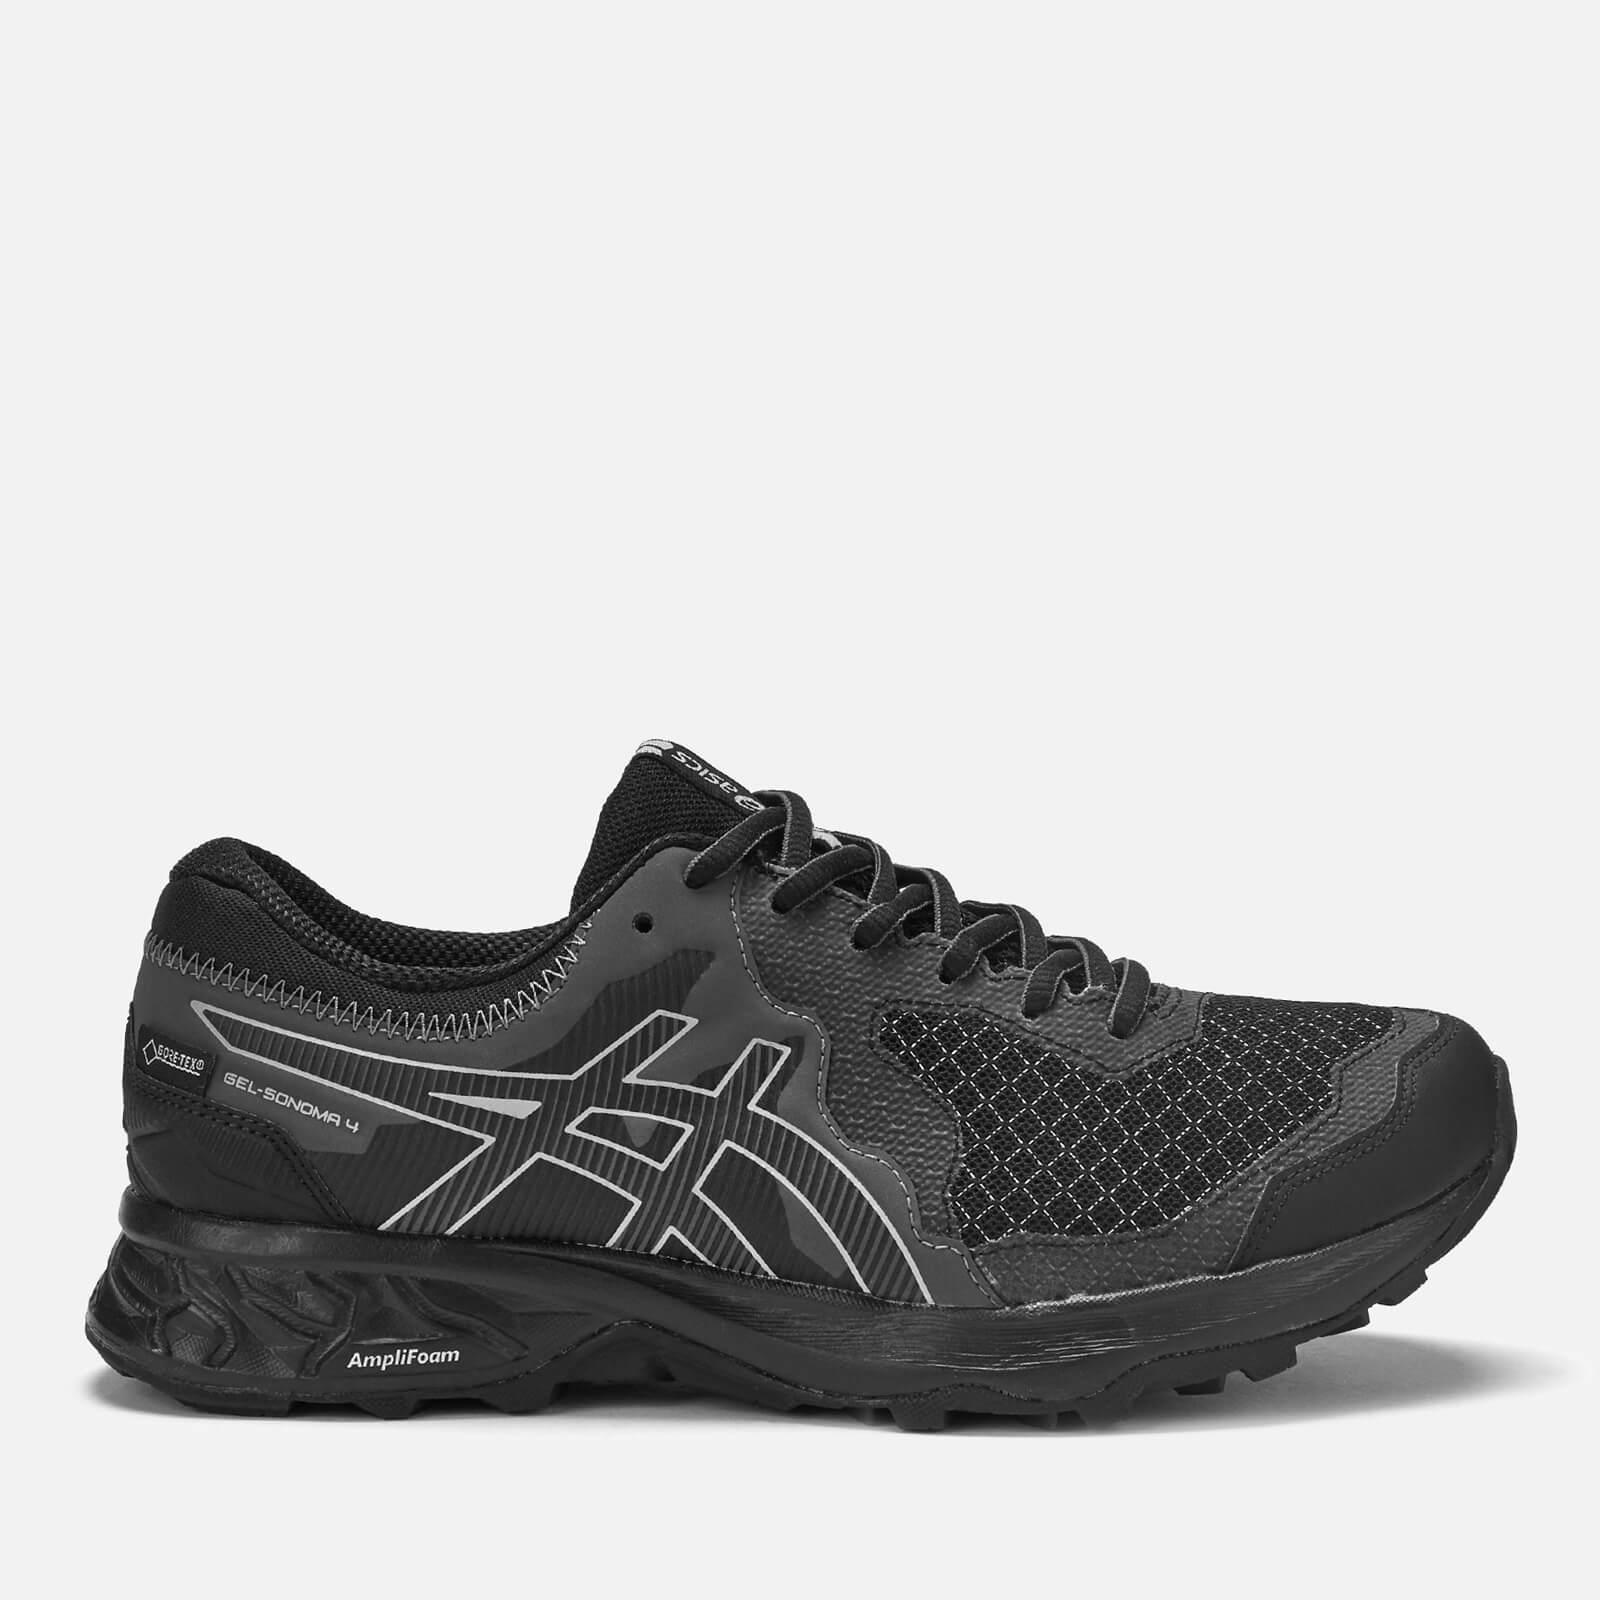 e04163562 Asics Women's Running Trail Gel Somoma 4 Goretex Trainers - Black/Stone Grey